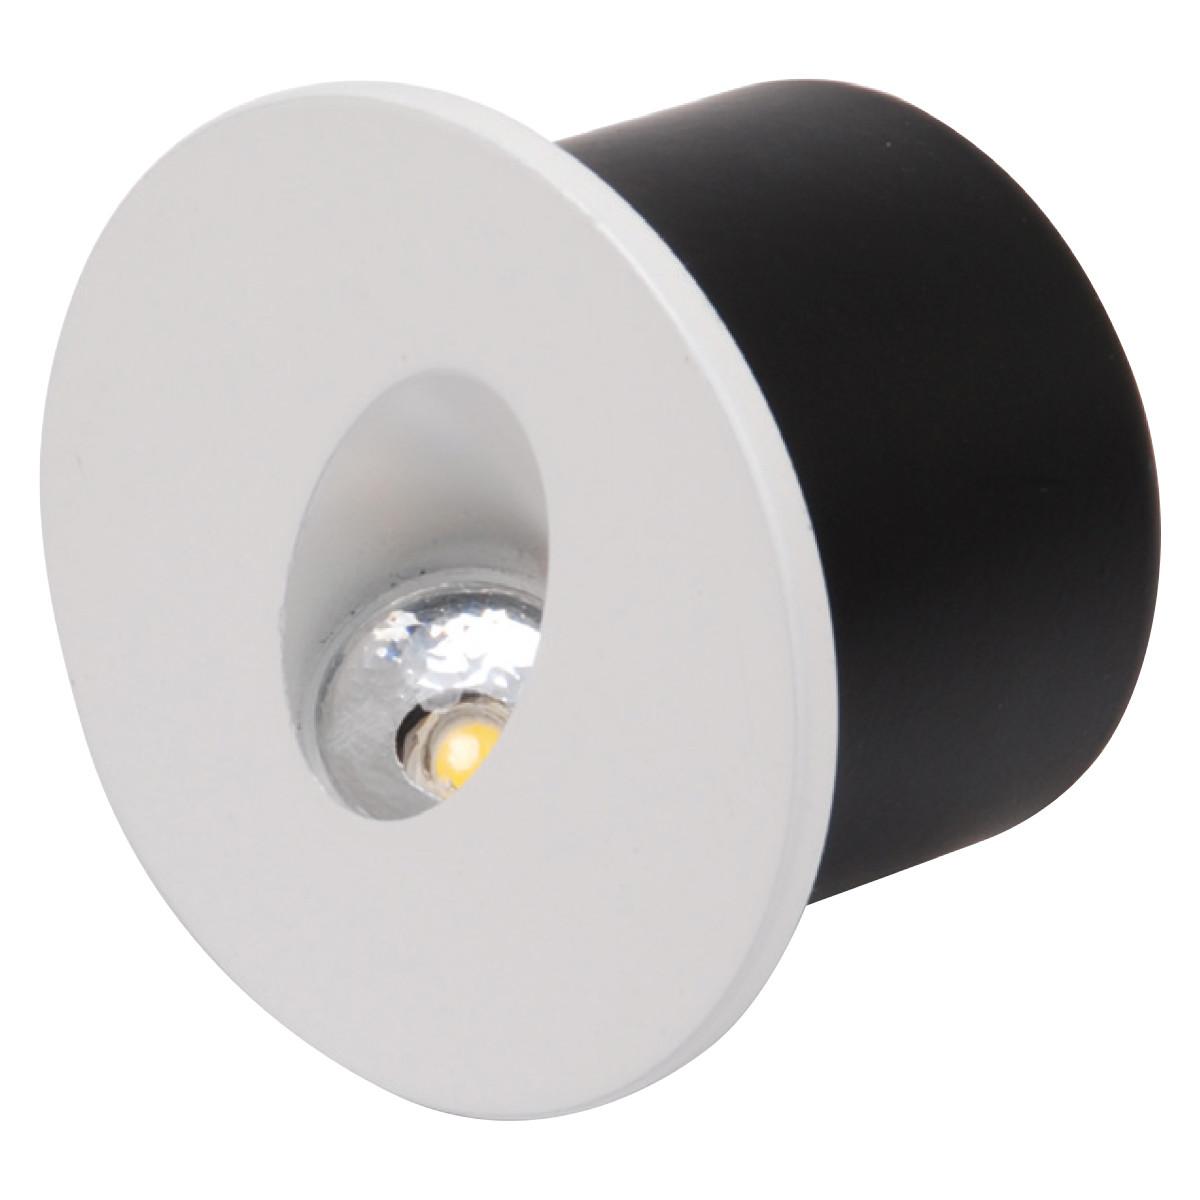 LED Trapspot - Inbouw Rond 3W - Natuurlijk Wit 4000K - Mat Wit Aluminium - Ø78mm